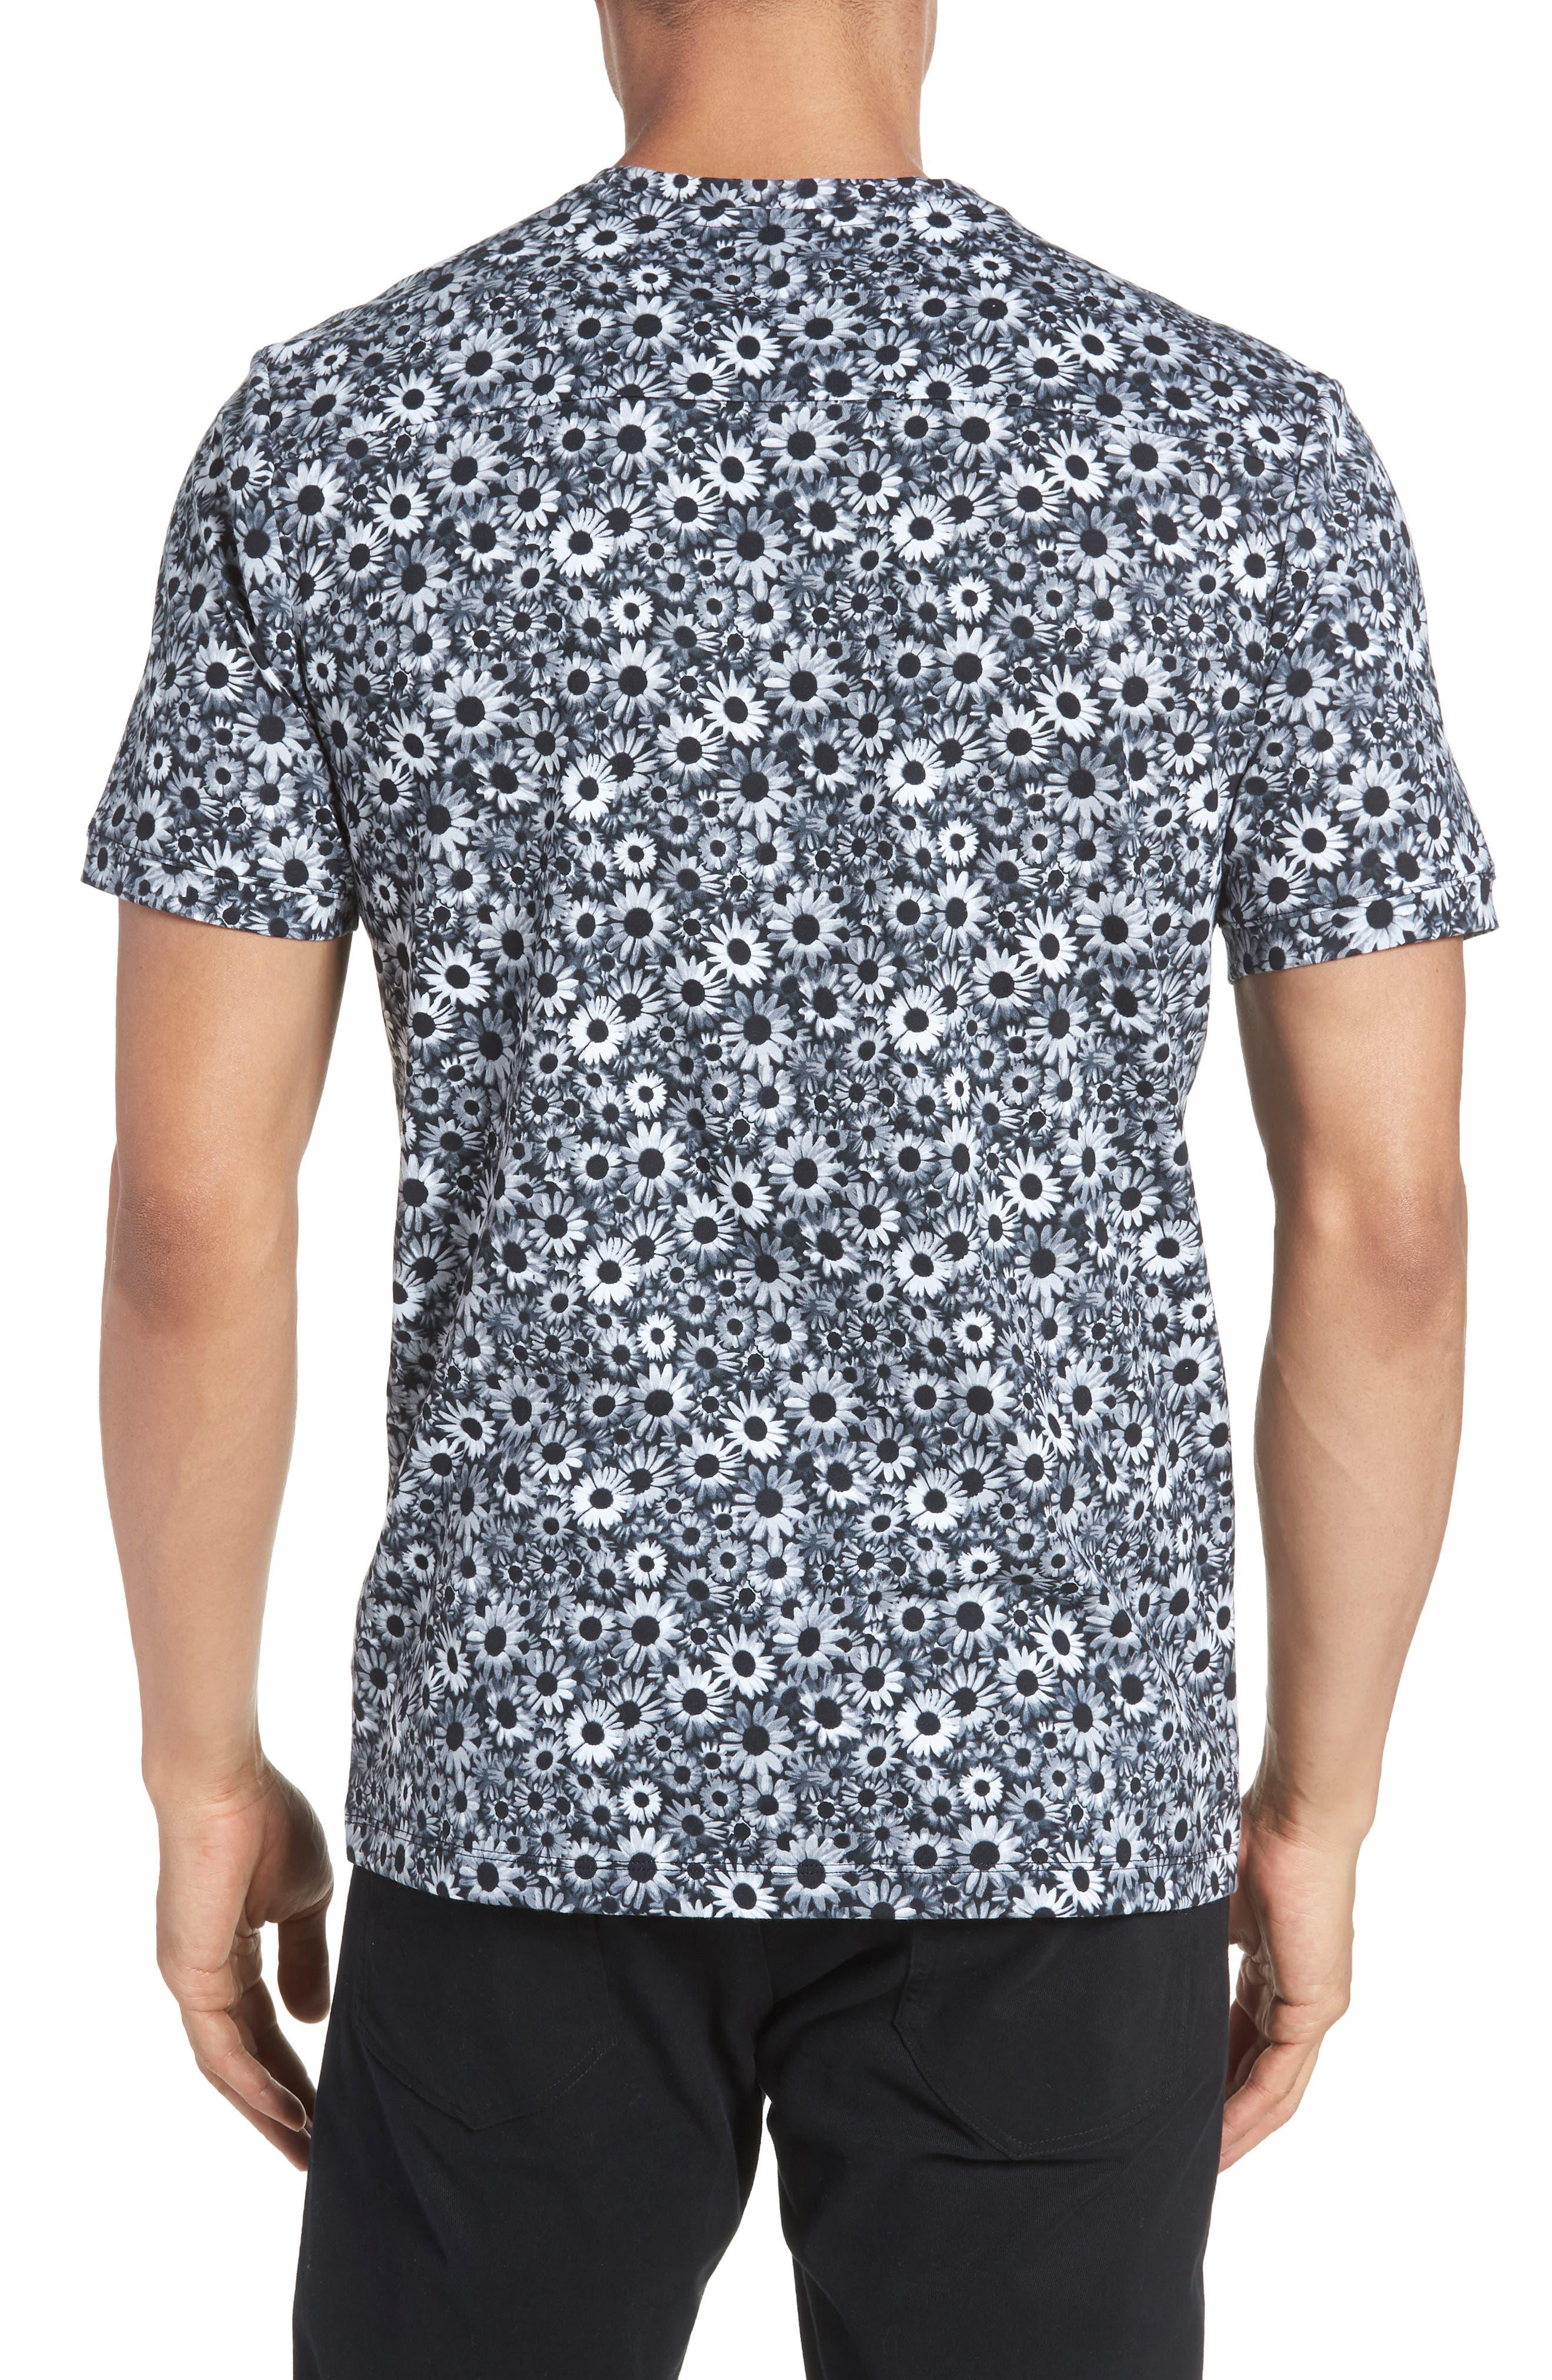 Print T-Shirt,                             Alternate thumbnail 2, color,                             BLACK WHITE DAISY FLORAL